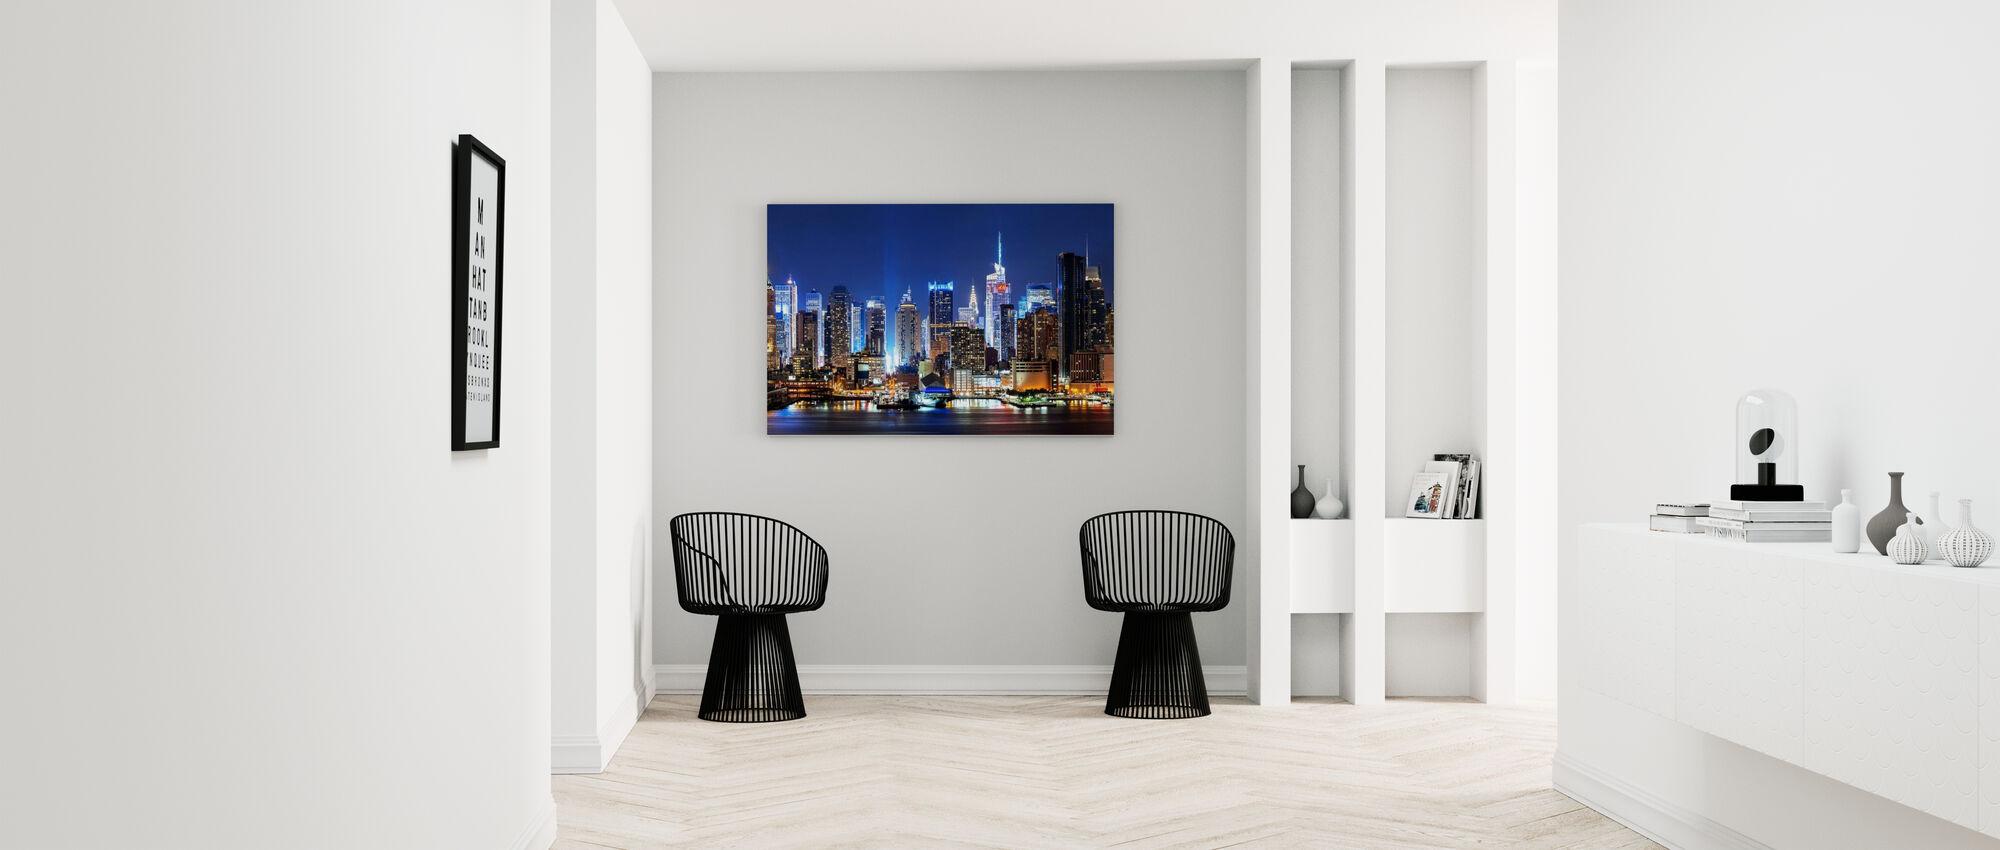 New York Night Skyline - Canvastavla - Hall